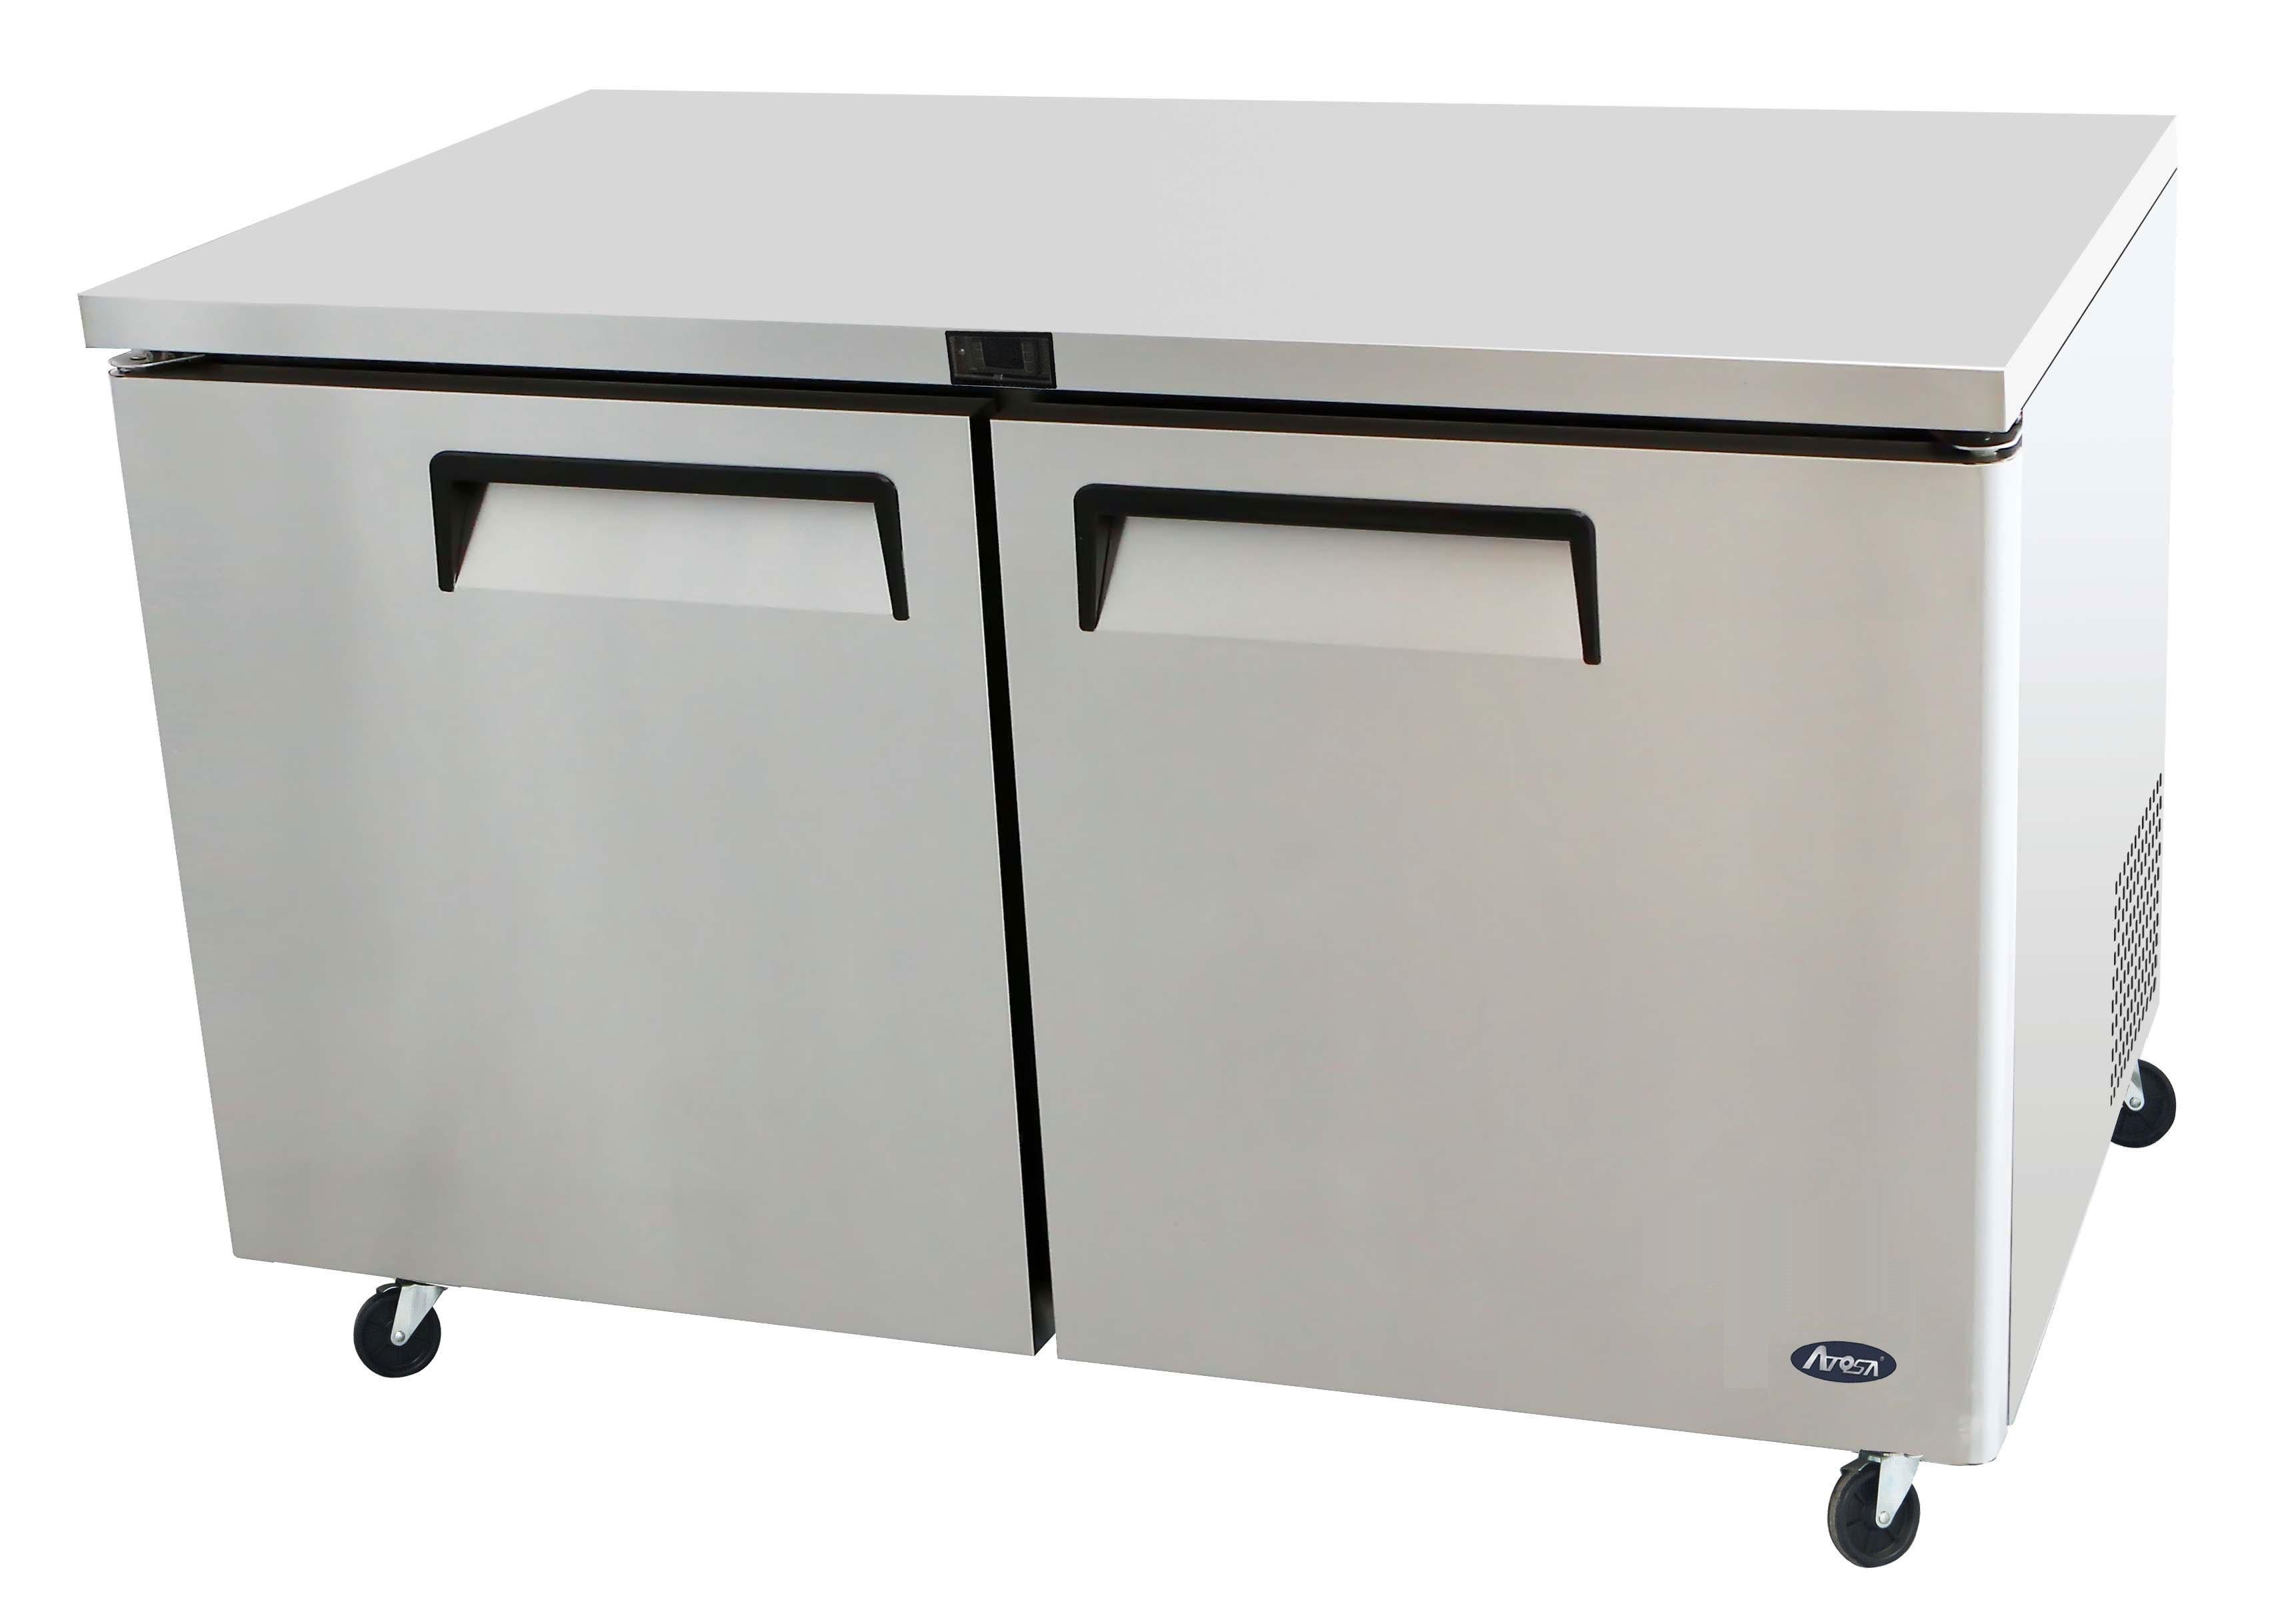 60'' Undercounter-Freezer Dimensions